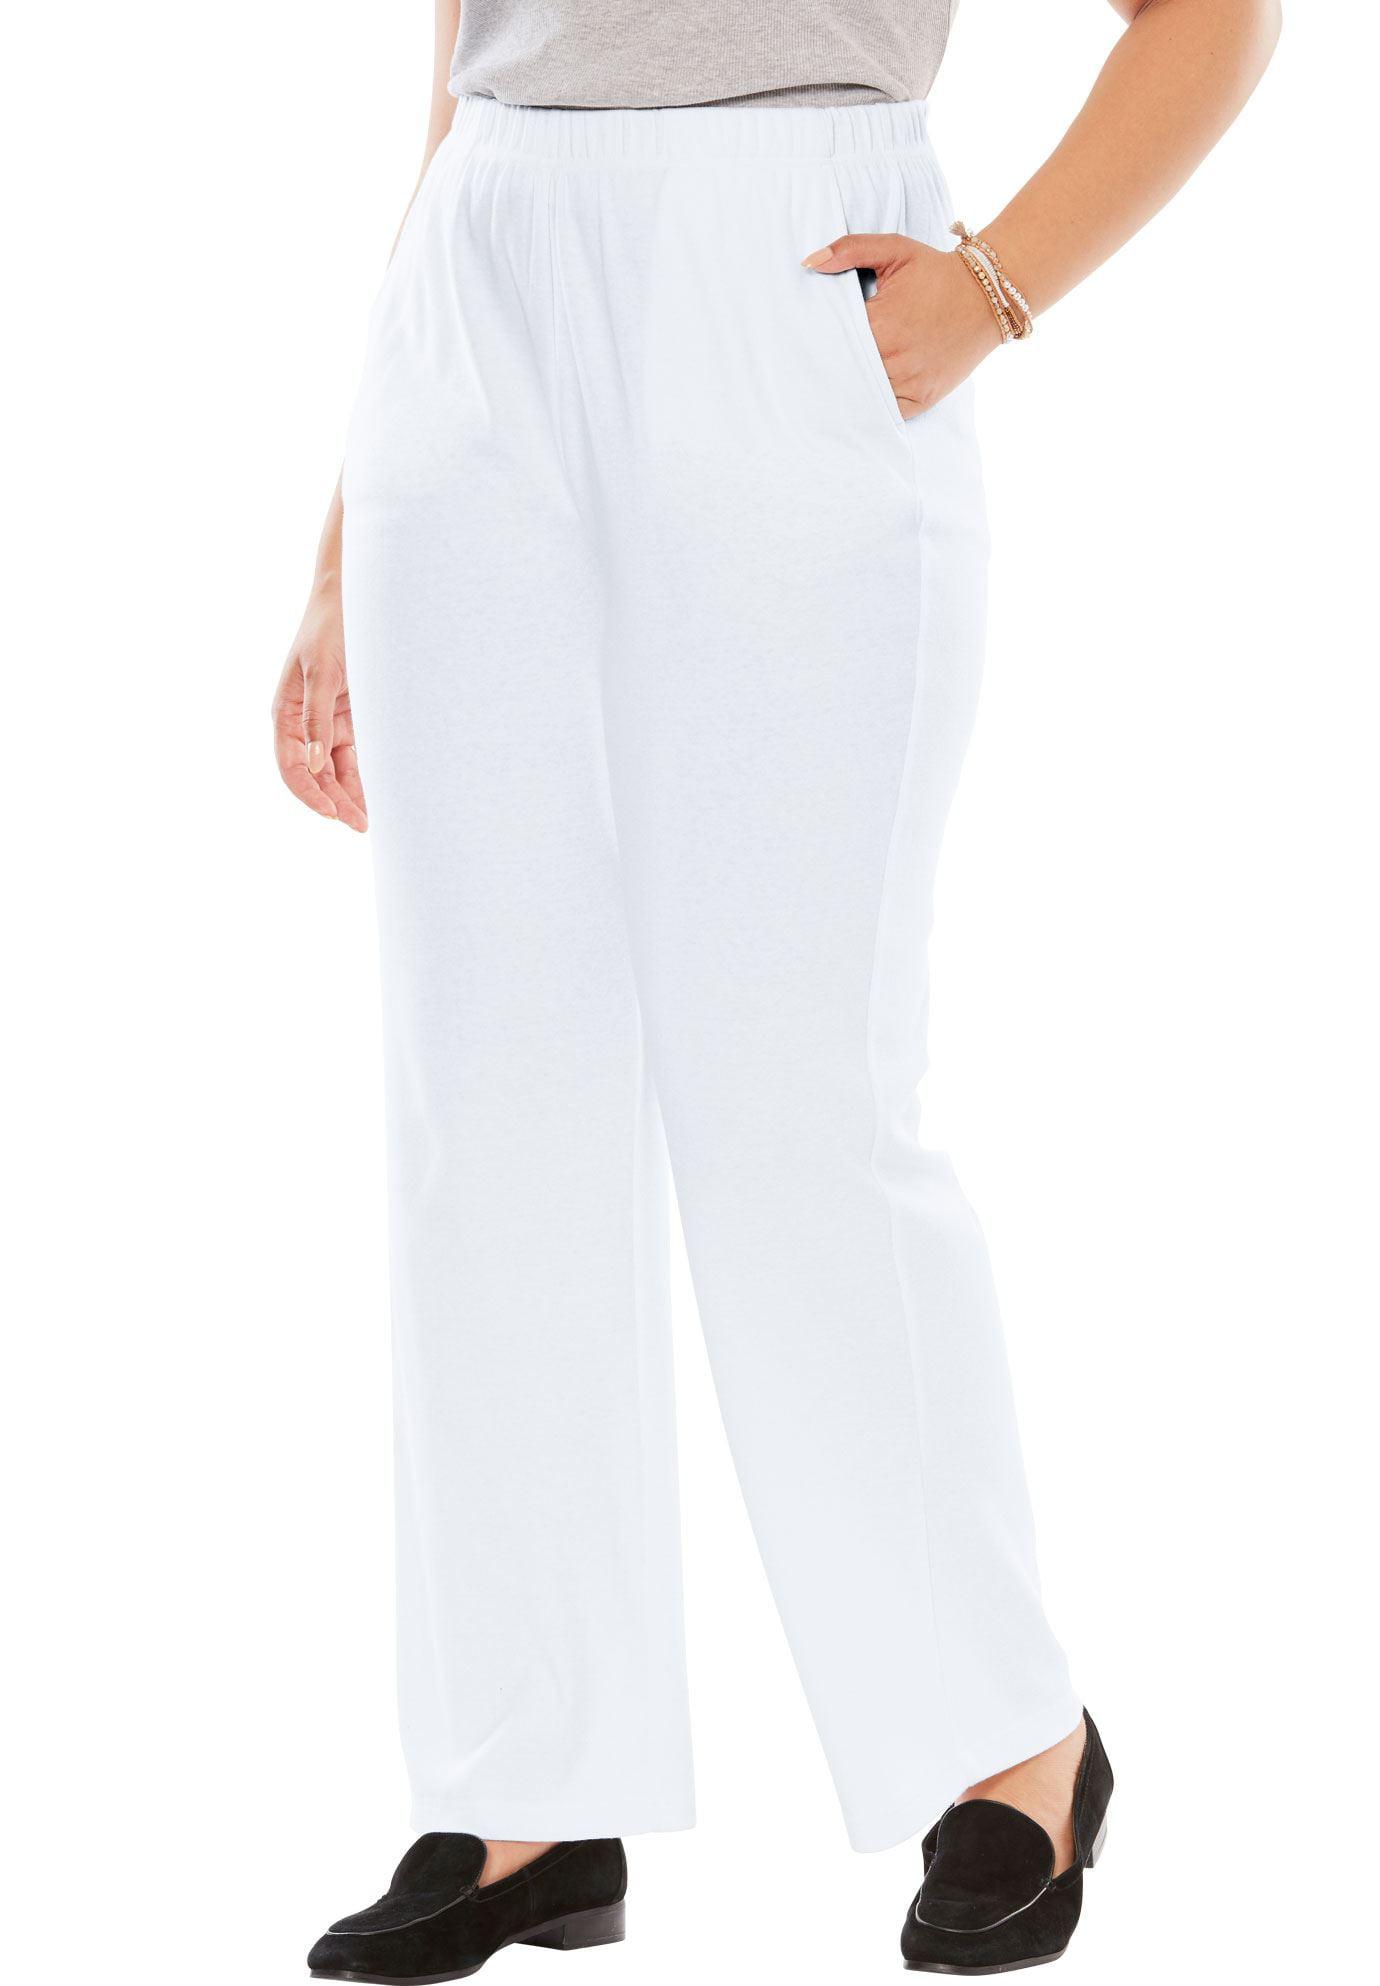 Woman Within Plus Size Petite 7-day Knit Wide Leg Pant